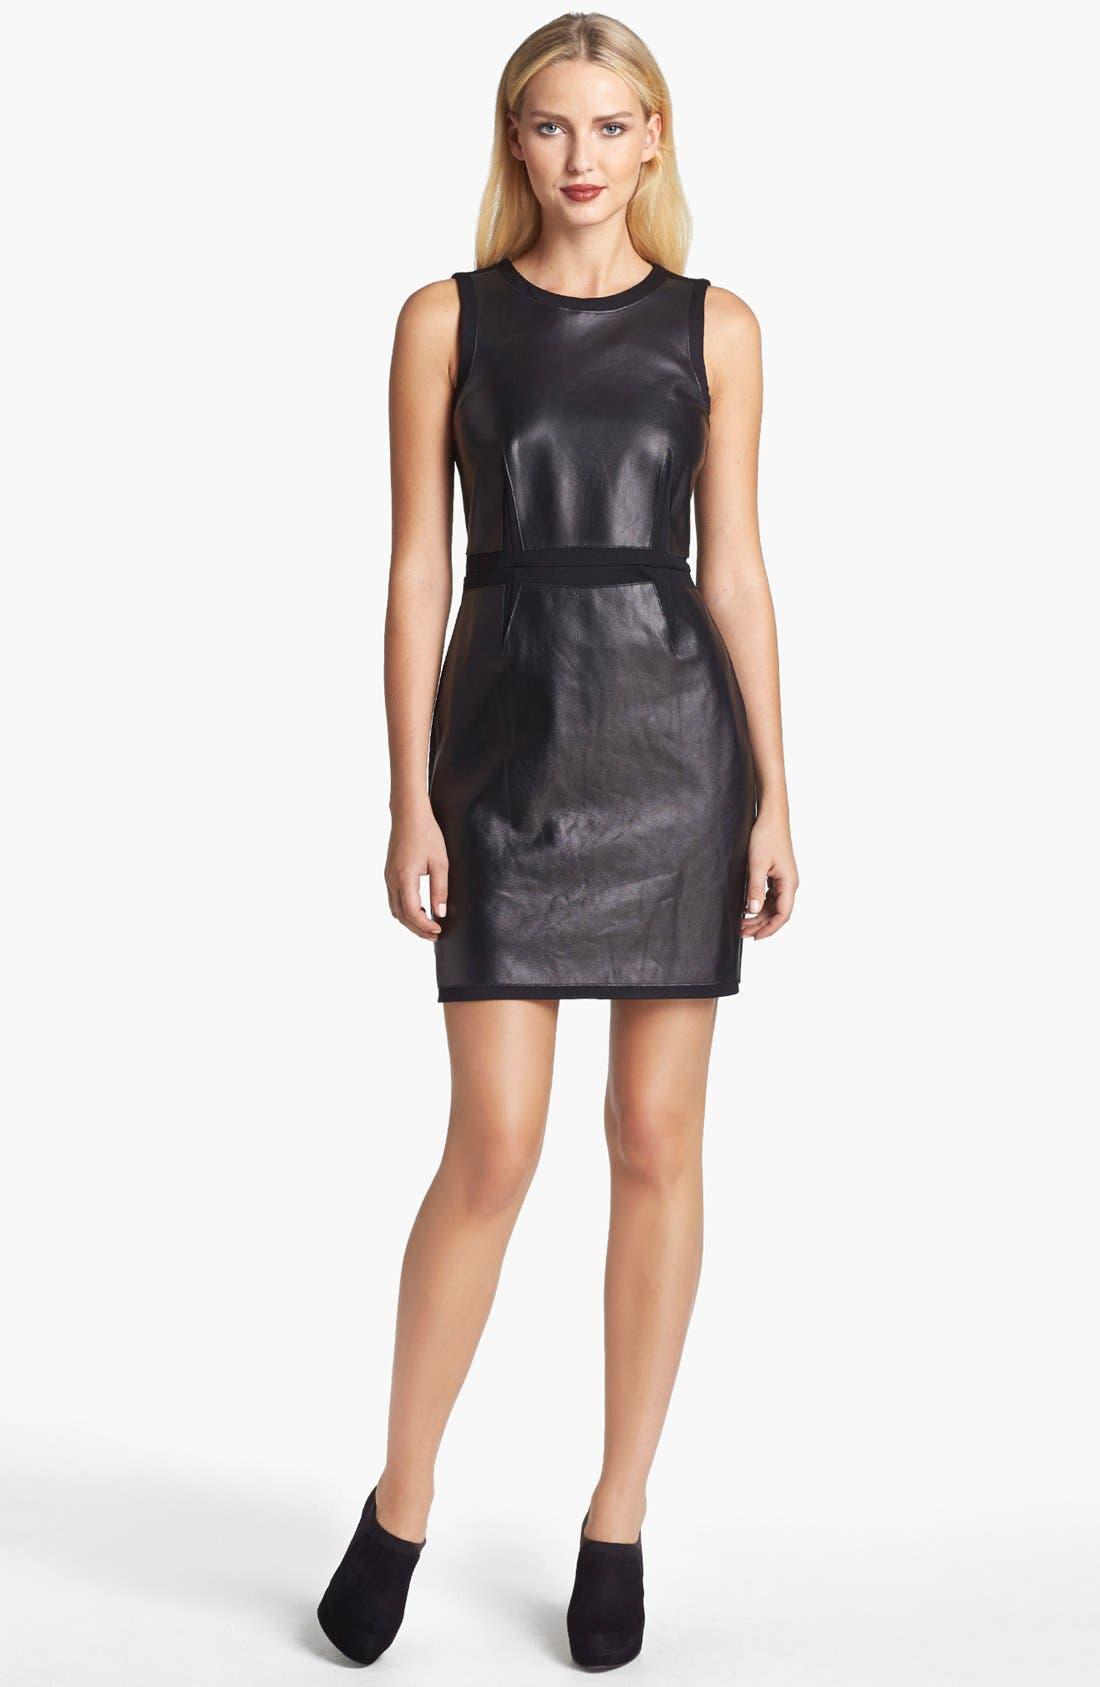 Main Image - ALICE & TRIXIE 'Tory' Leather & Ponte Knit Dress